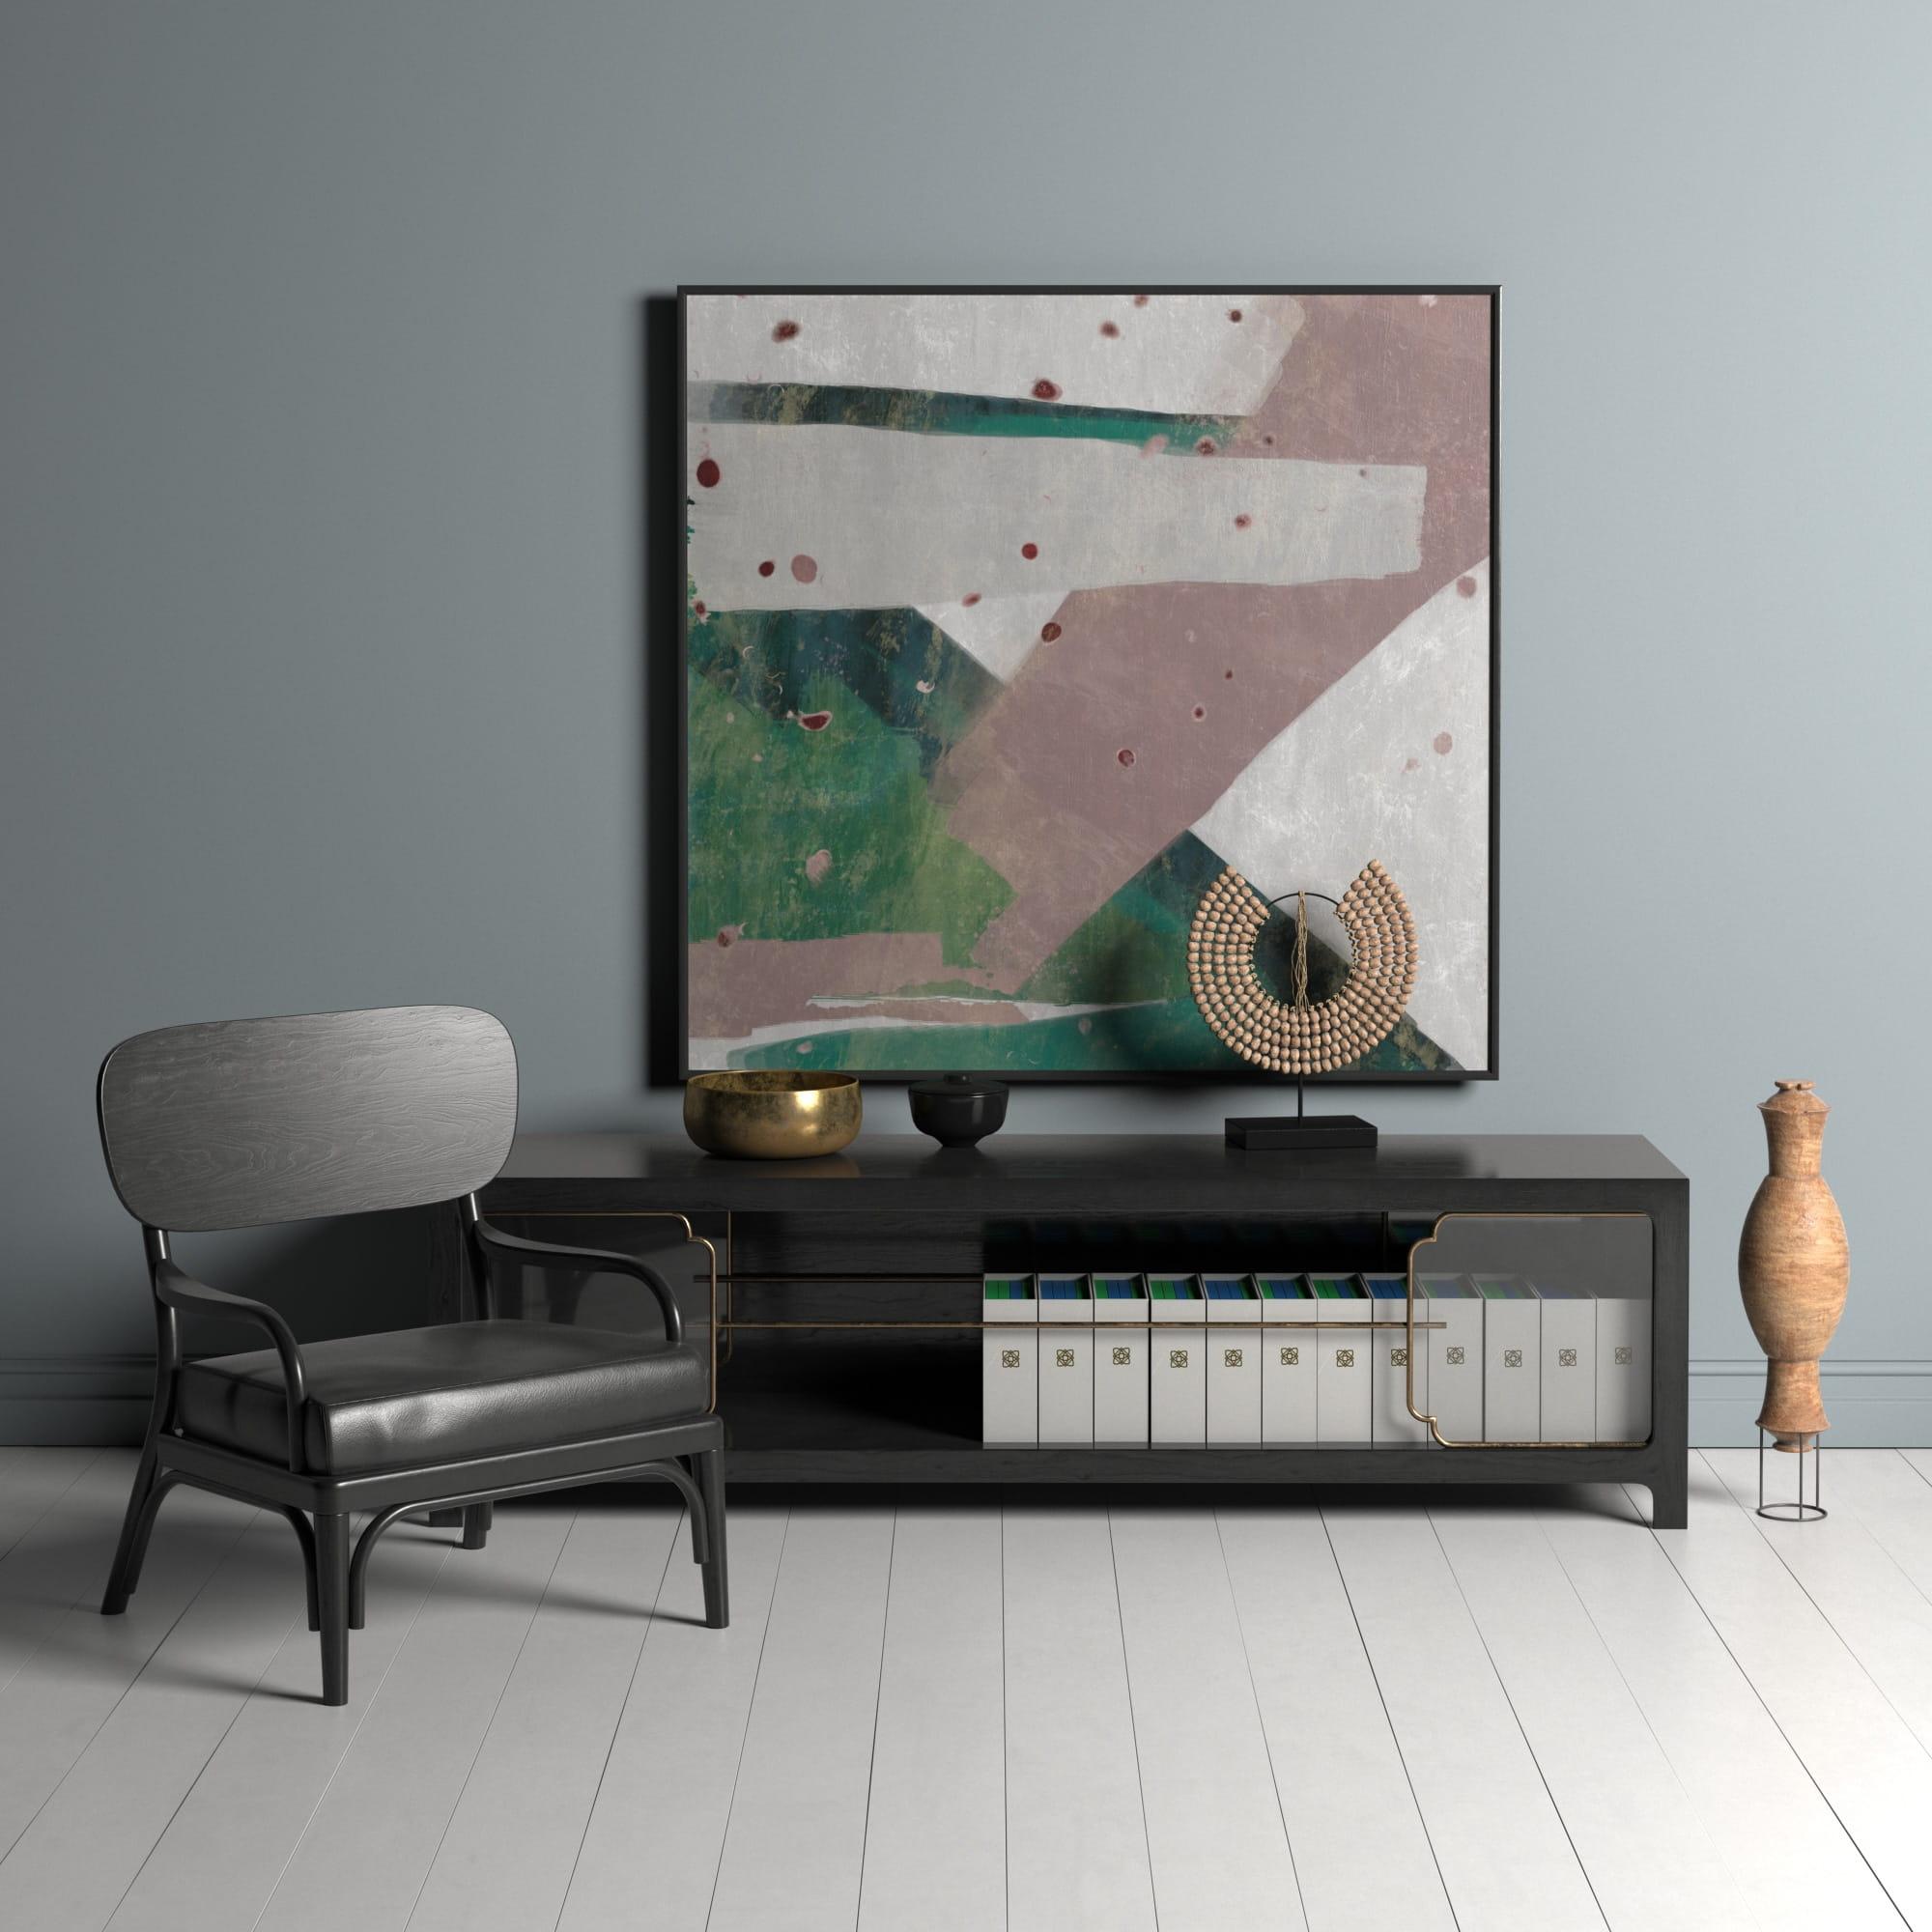 furniture set 8 AM225